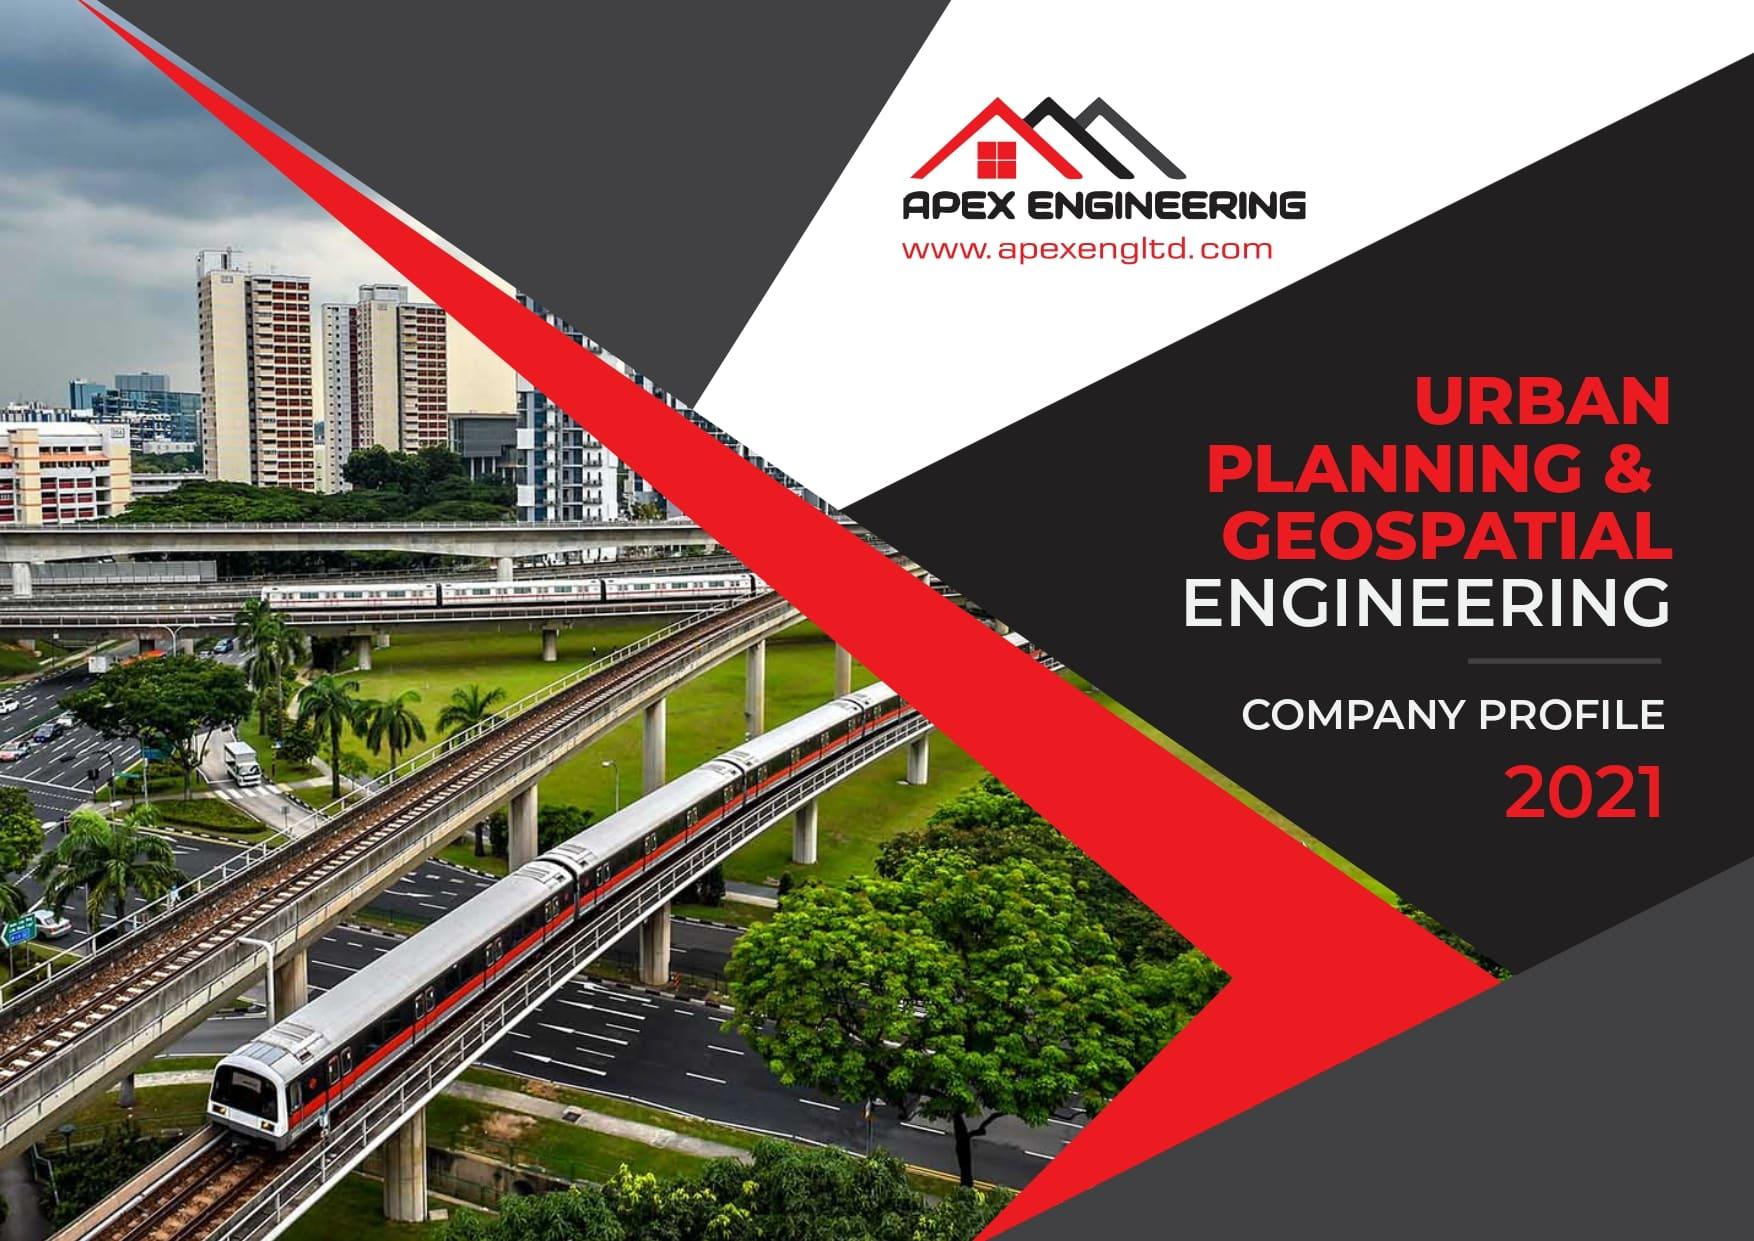 Apex Engineering Company Profile